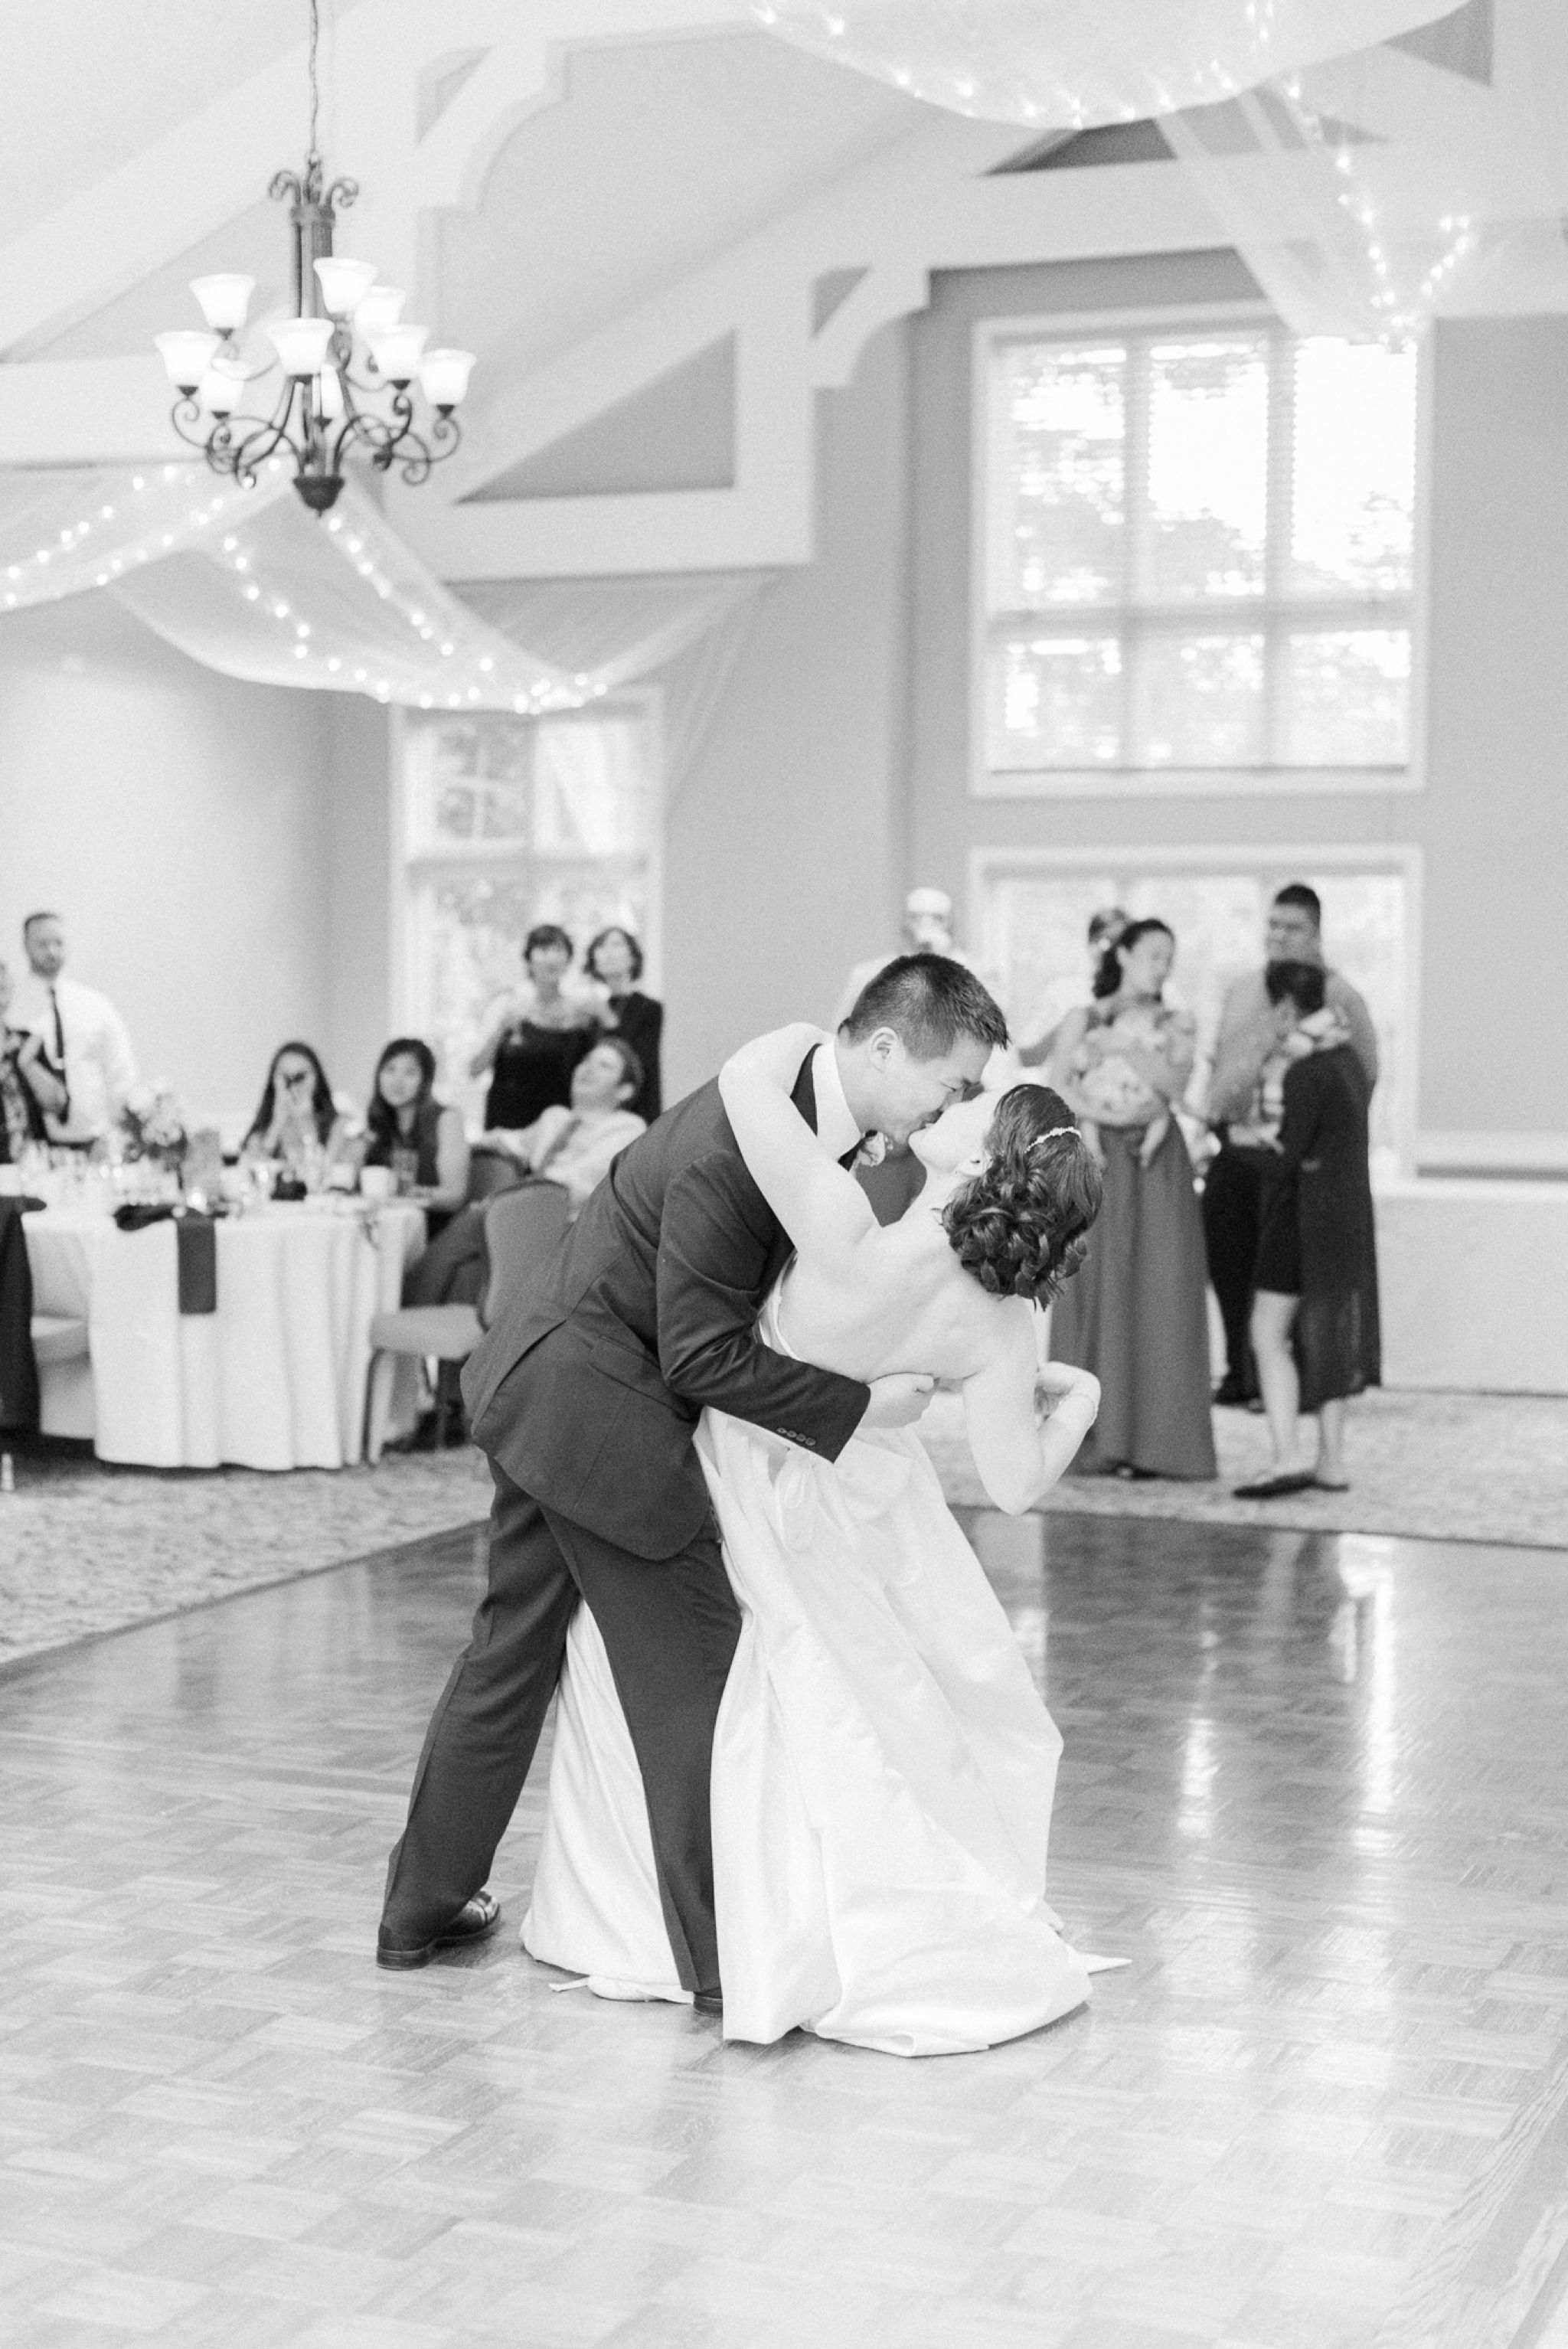 brookside-golf-country-club-wedding-columbus-ohio-143.jpg